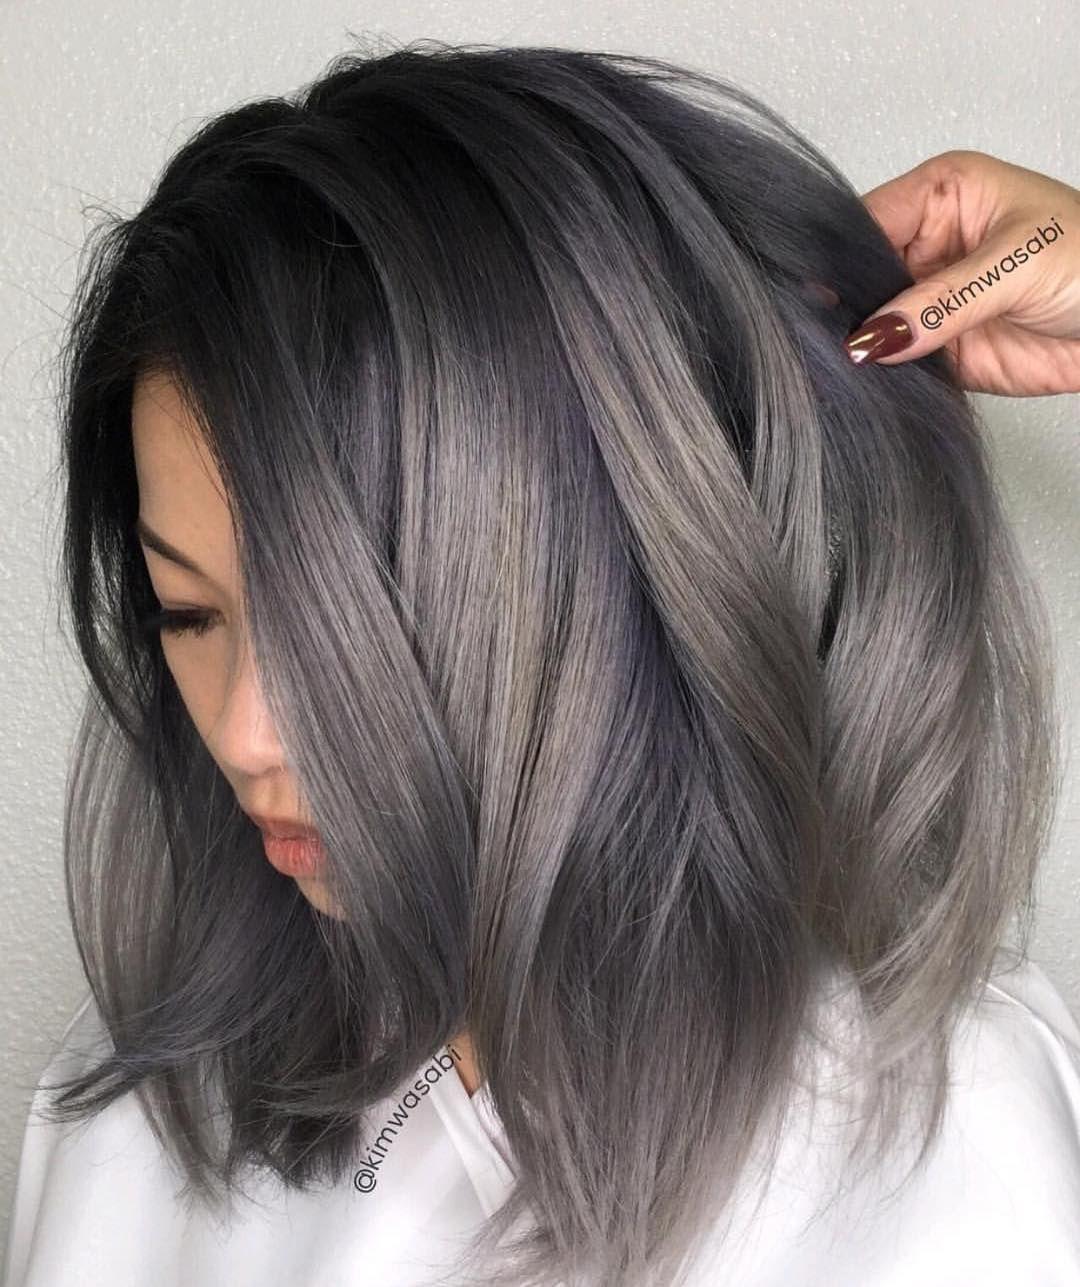 12 6k Likes 56 Comments Da Hair Beauty Mens Styles